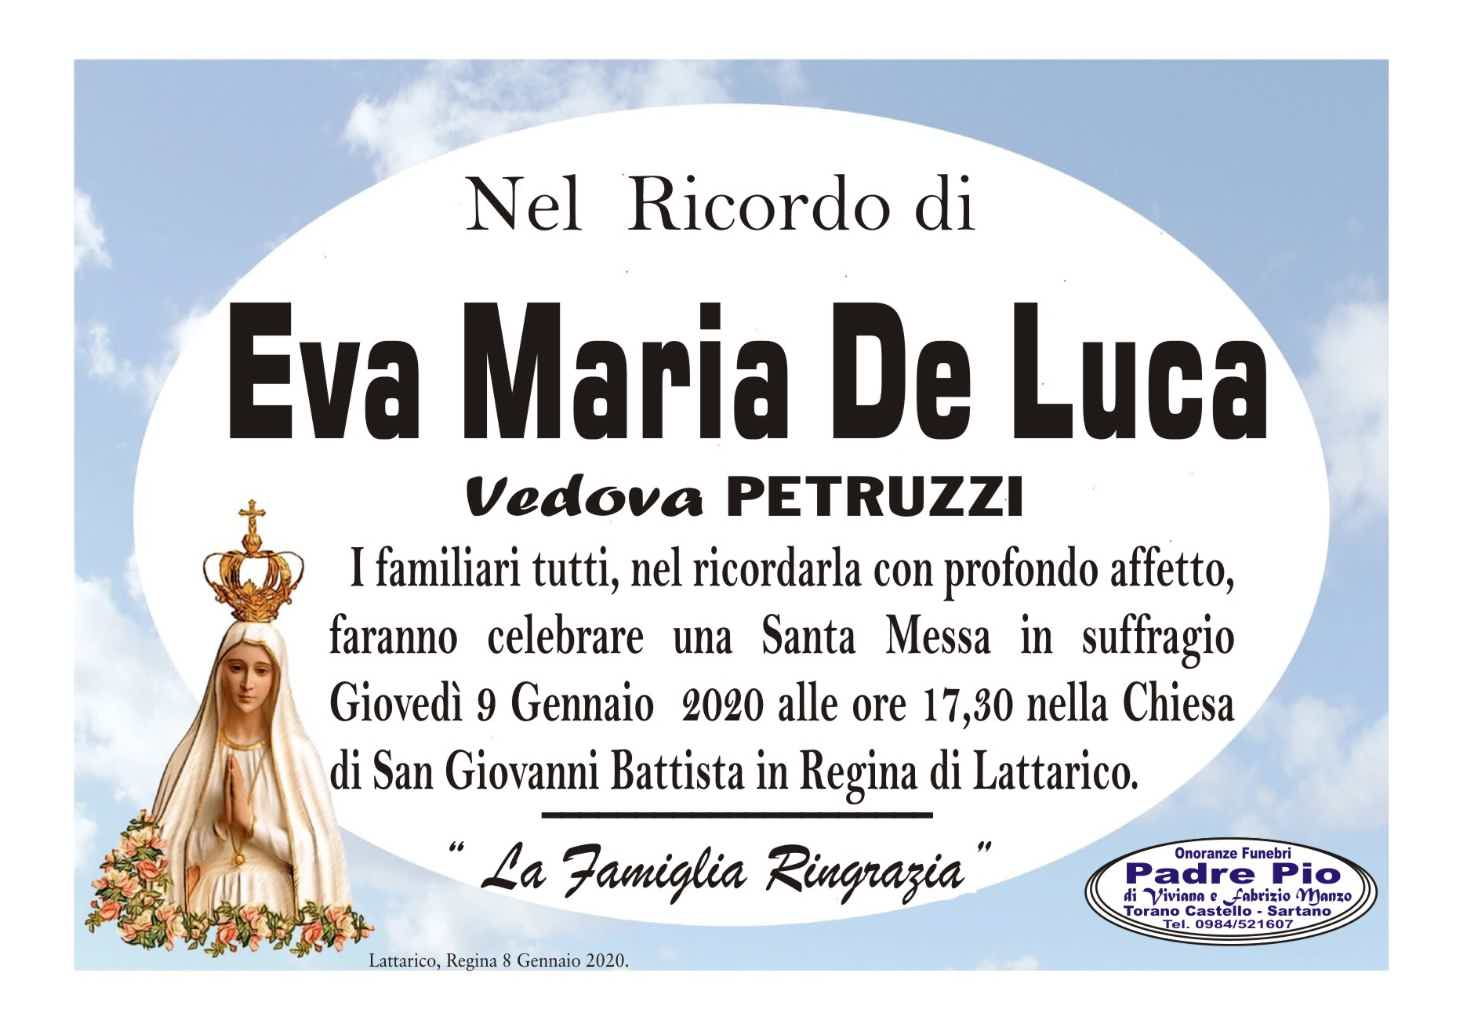 Eva Maria De Luca